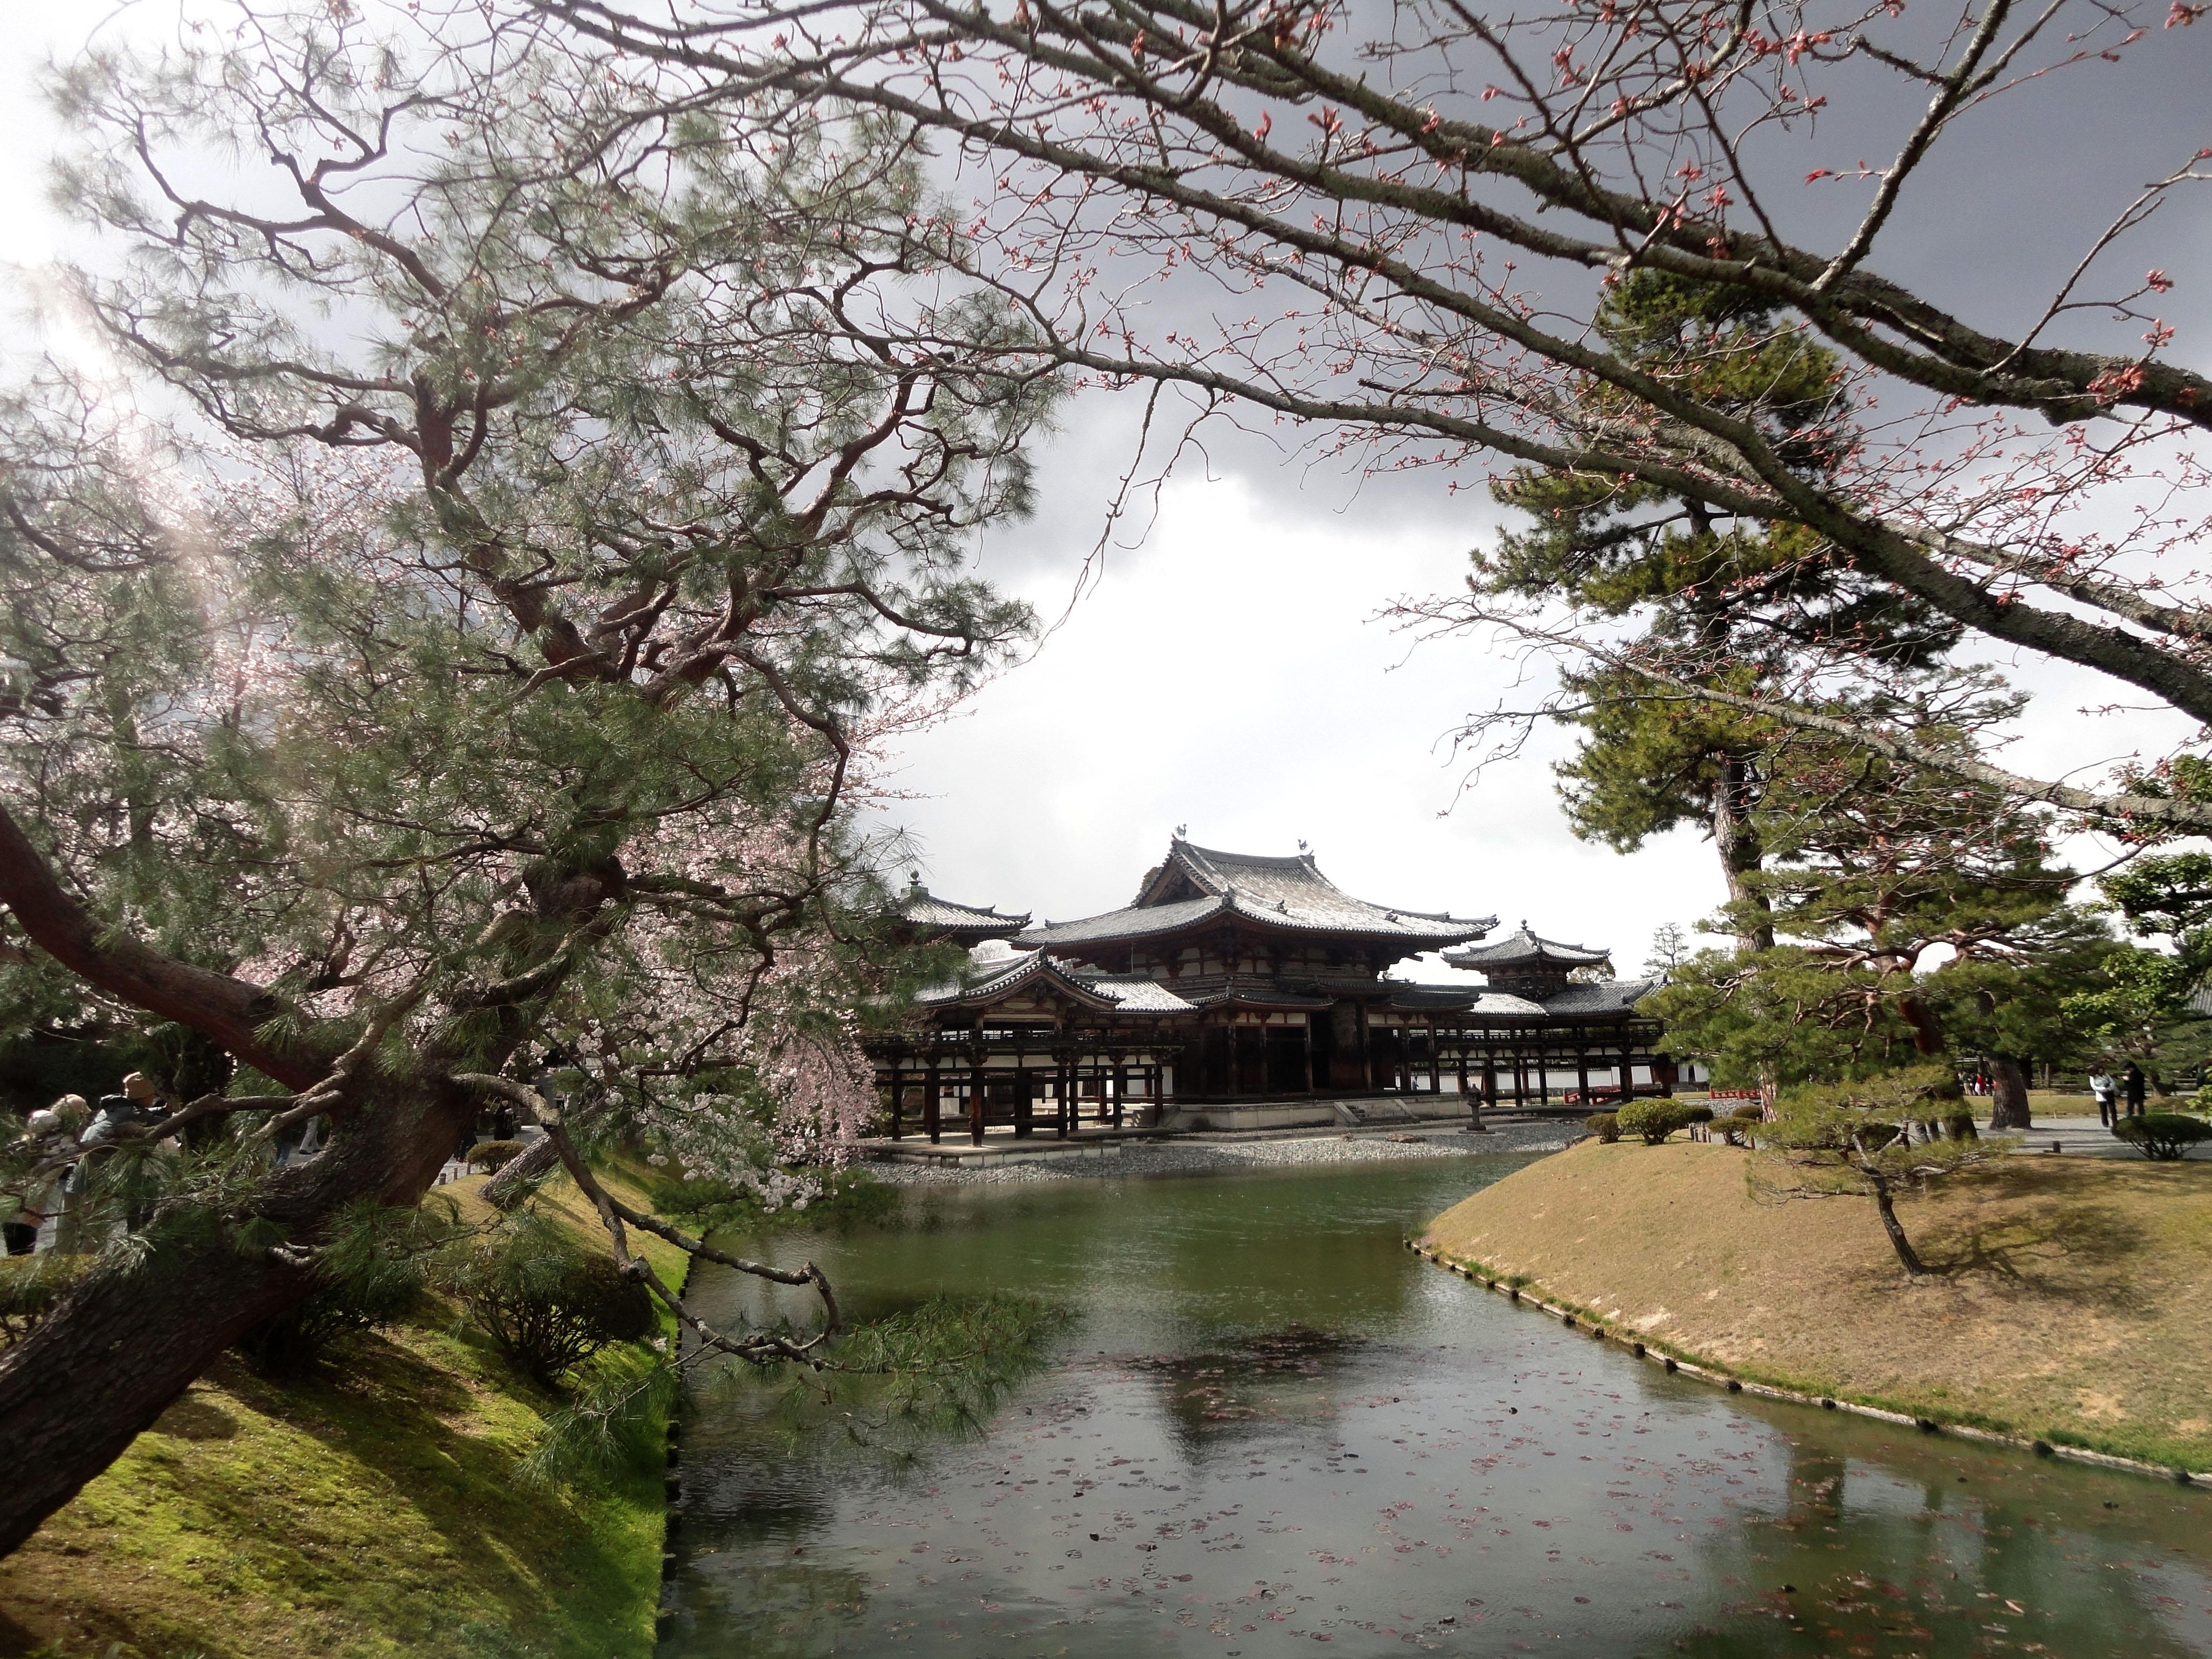 Byodo in temple Jodo shiki garden walkway facing Phoenix Hall Kyoto Japan 04